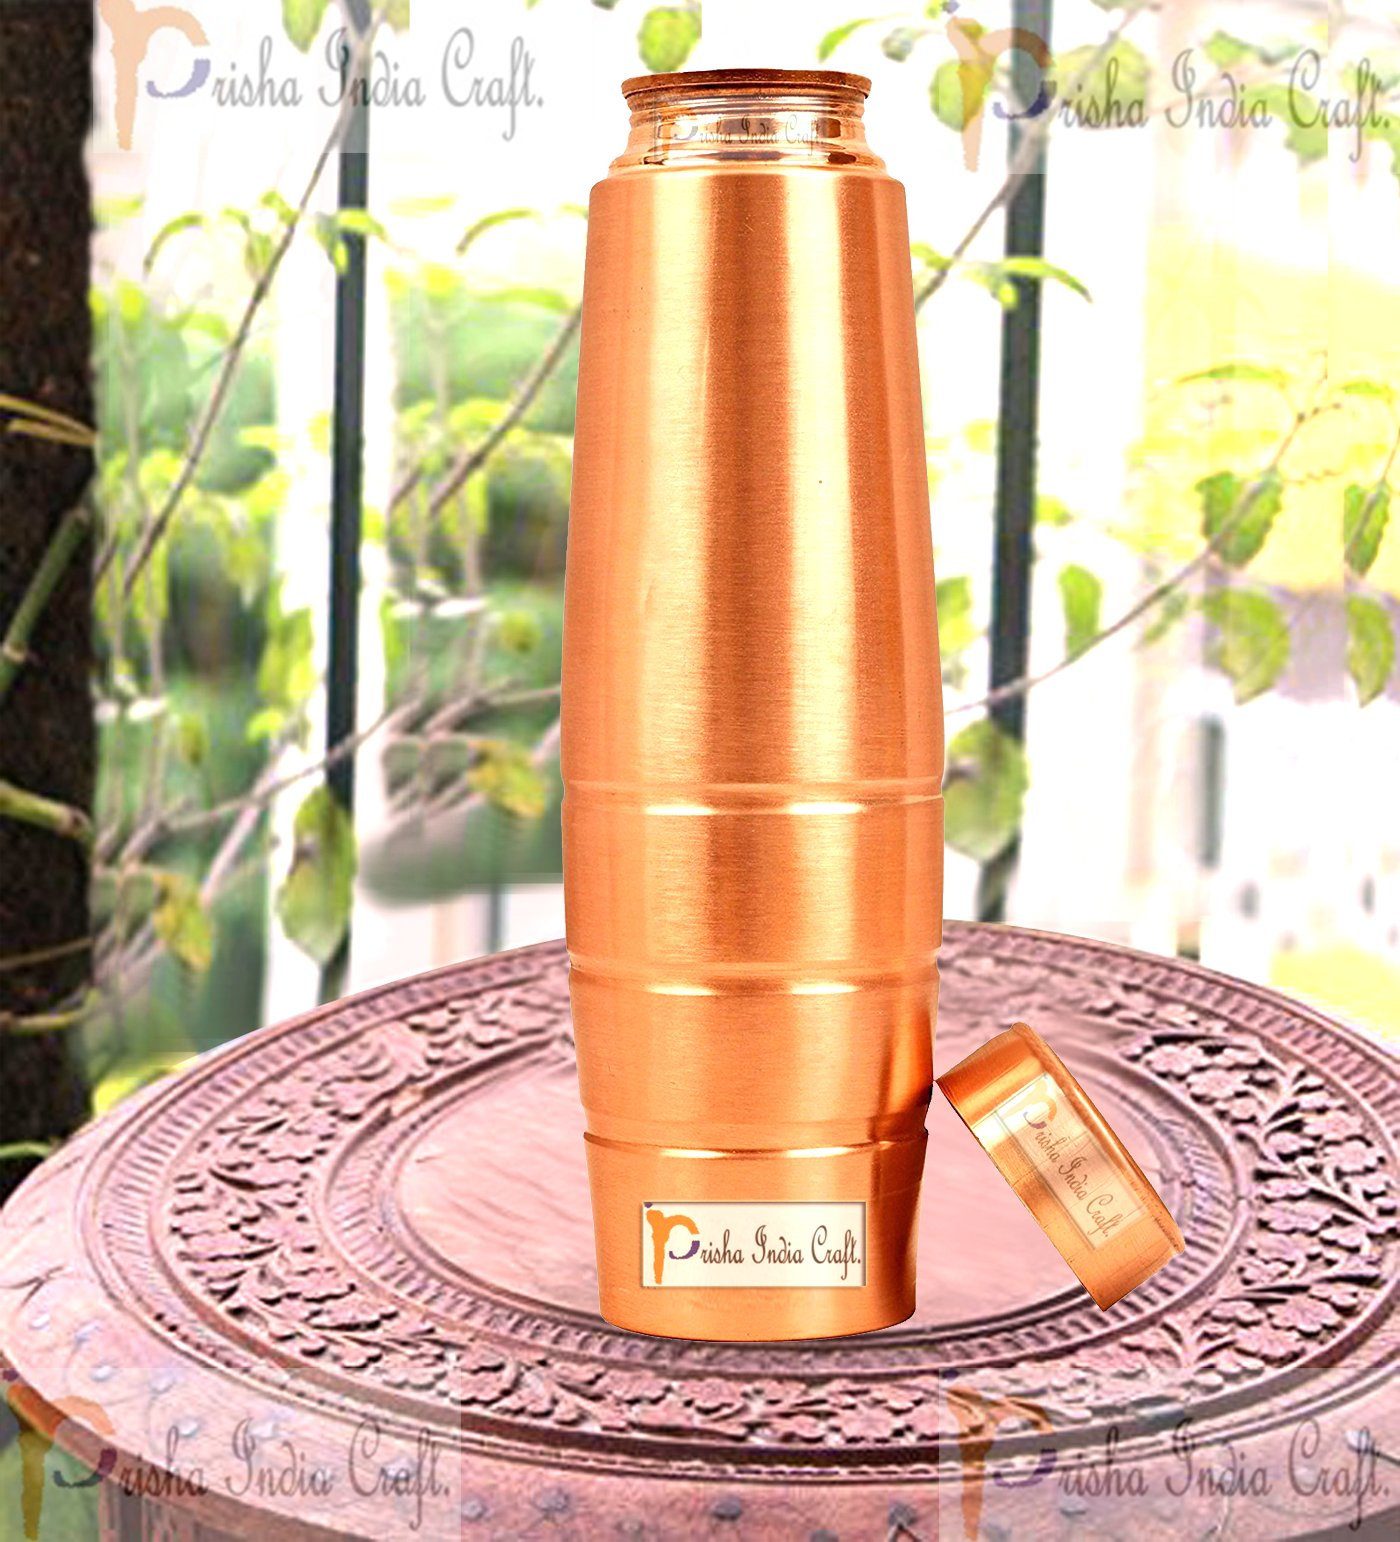 Prisha India Craft New Design Stylish Copper Bottle with Grip, Storage & Travelling Purpose, Yoga Ayurveda Healing, 1000 ML